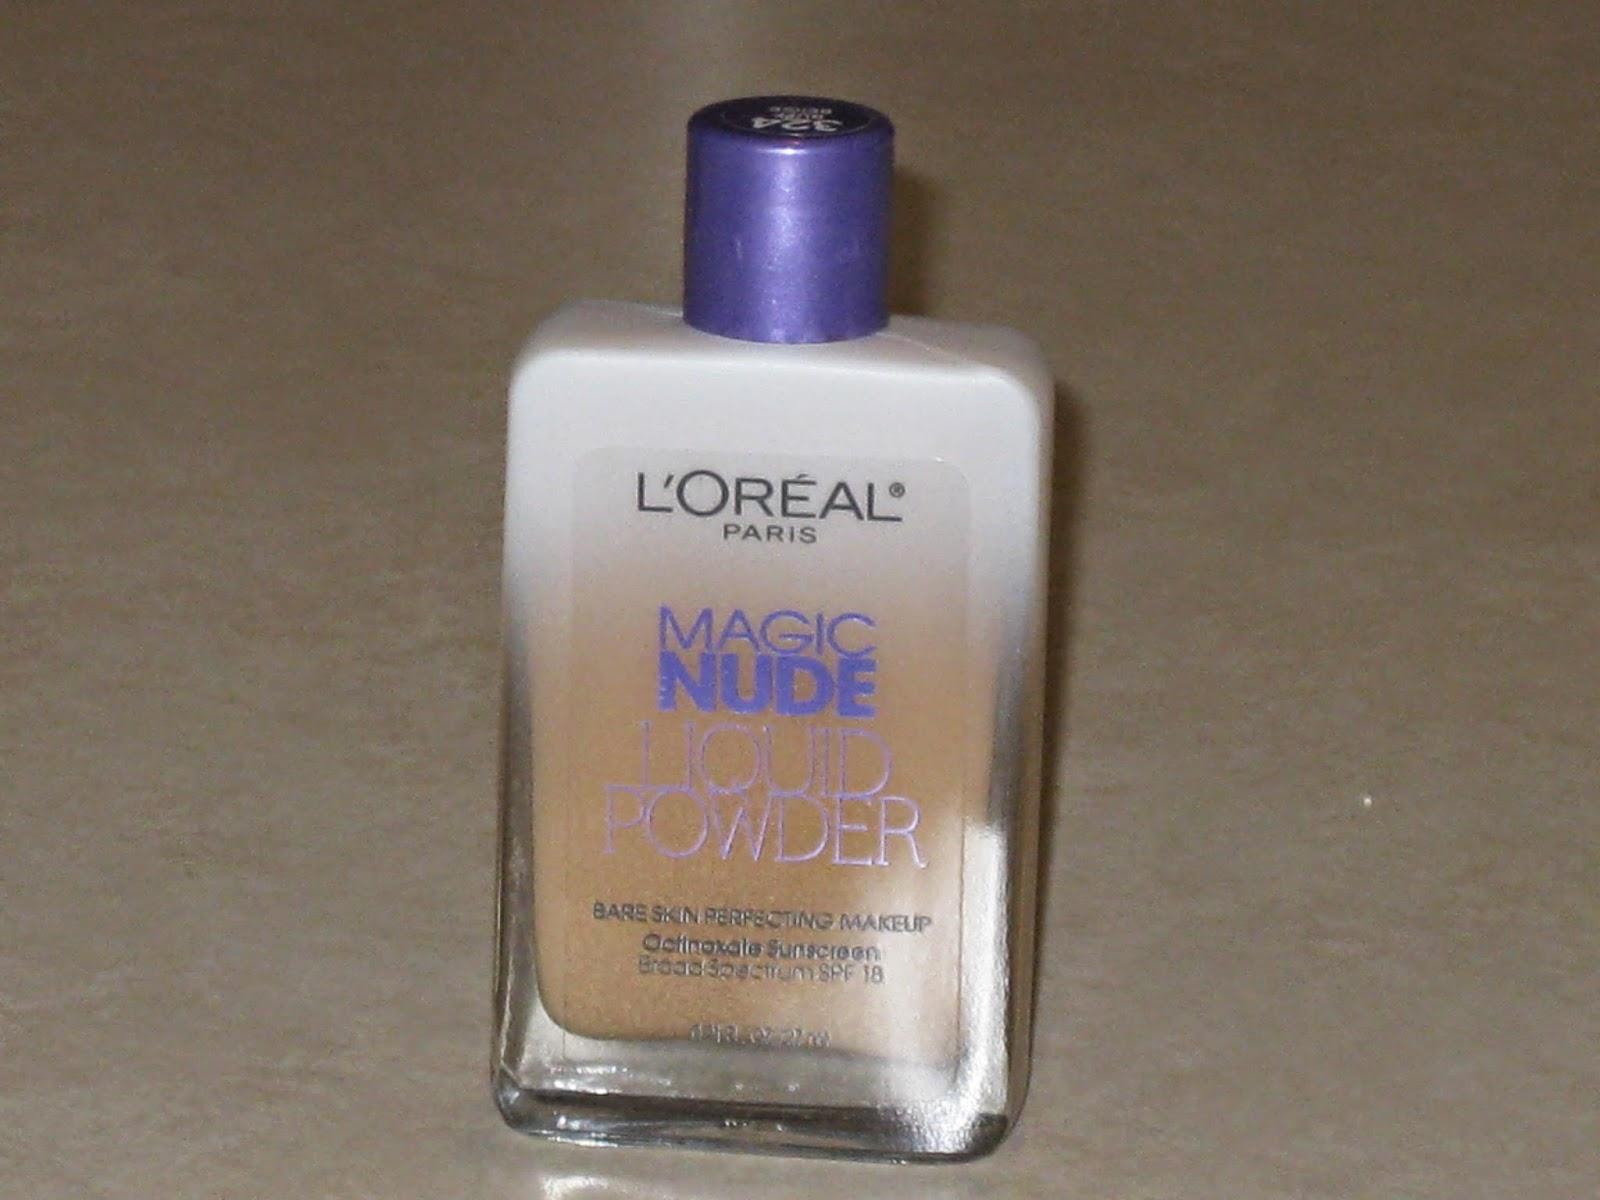 Amazon.com : LOreal Paris Magic Nude Liquid Powder Bare Skin Perfecting Makeup SPF 18, Natural